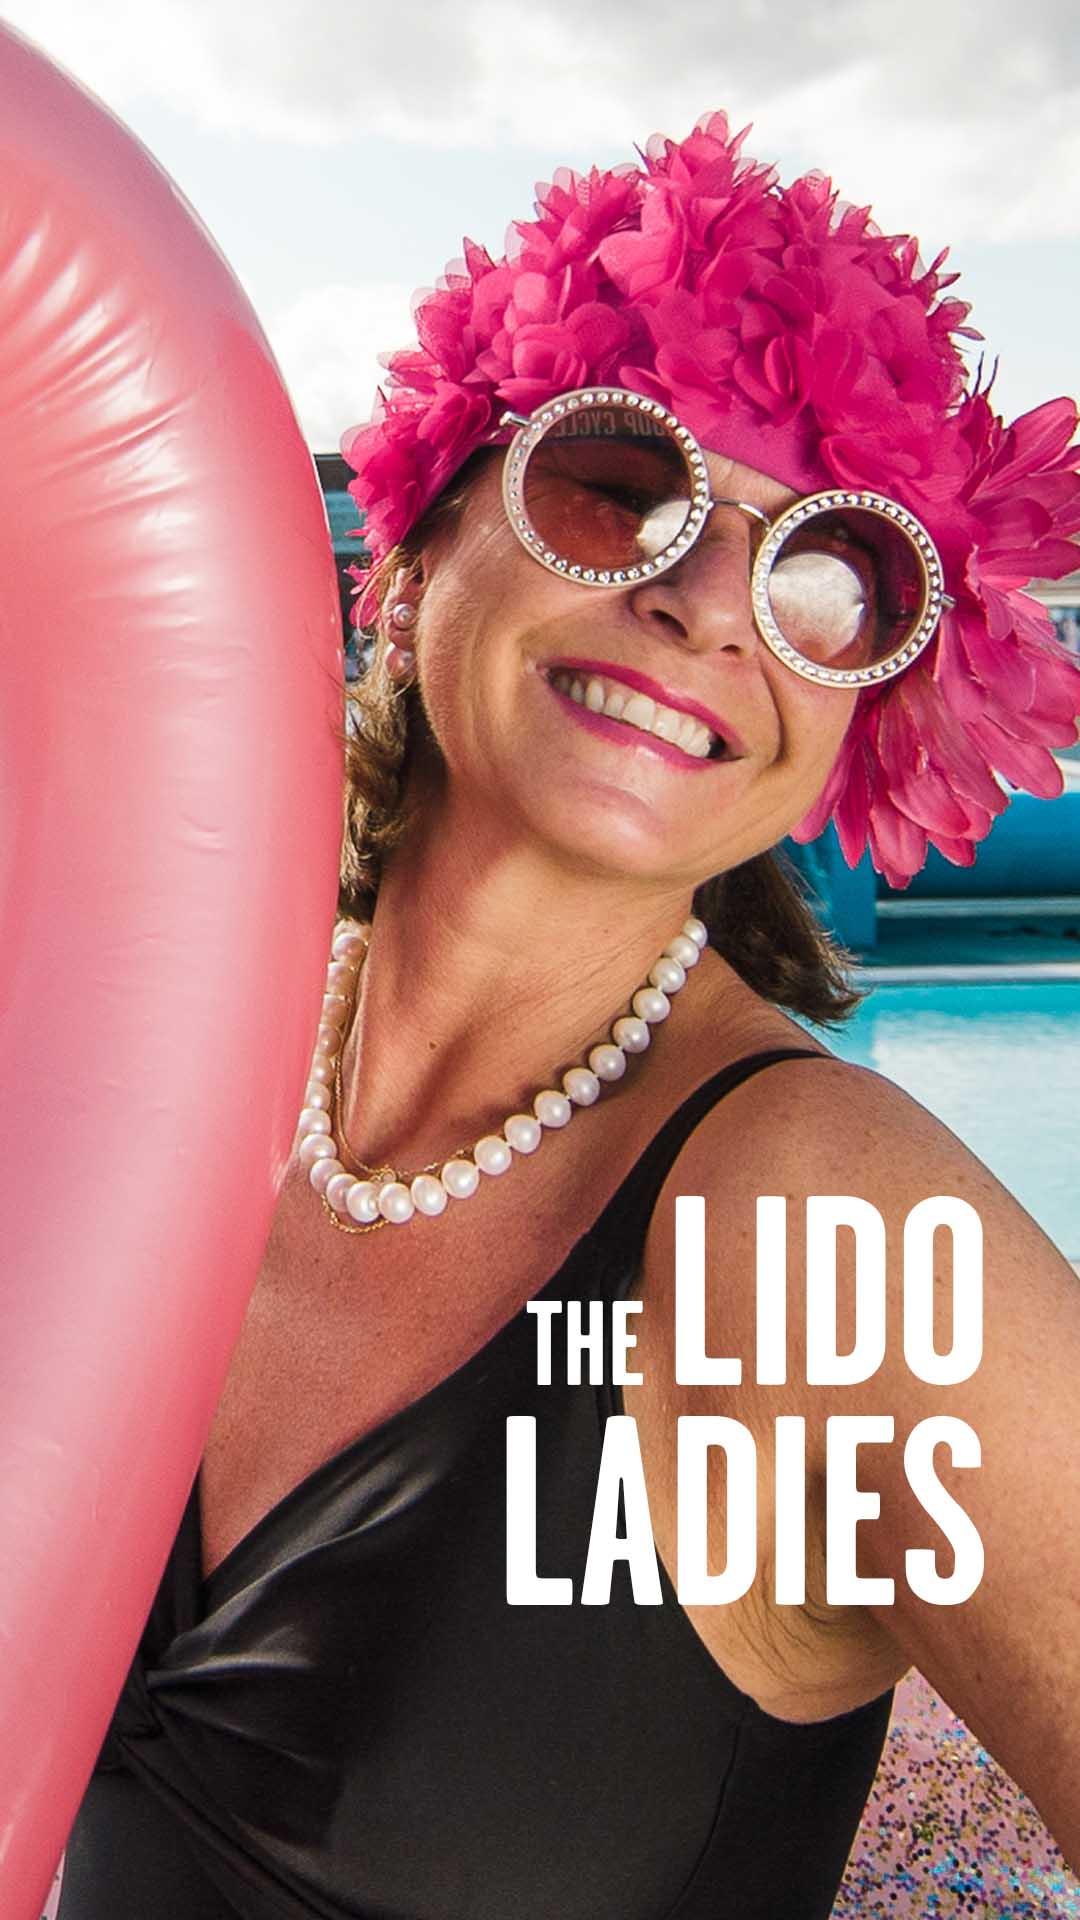 Lido ladies story 01